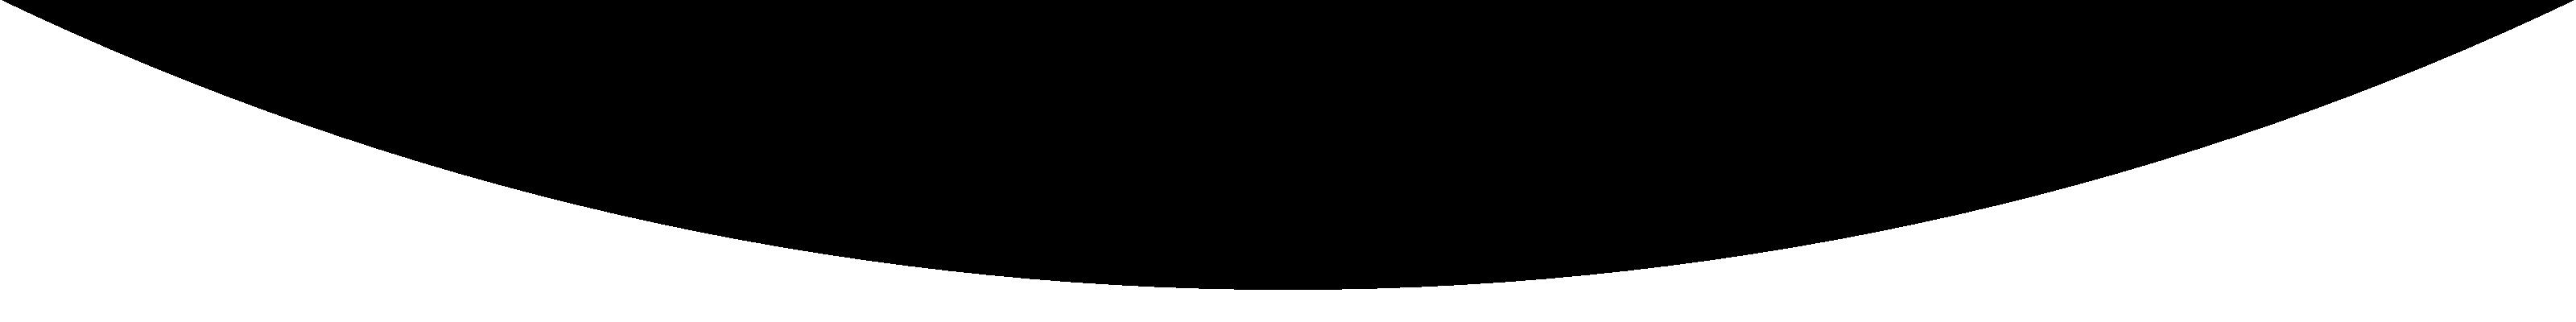 Bottom Curve